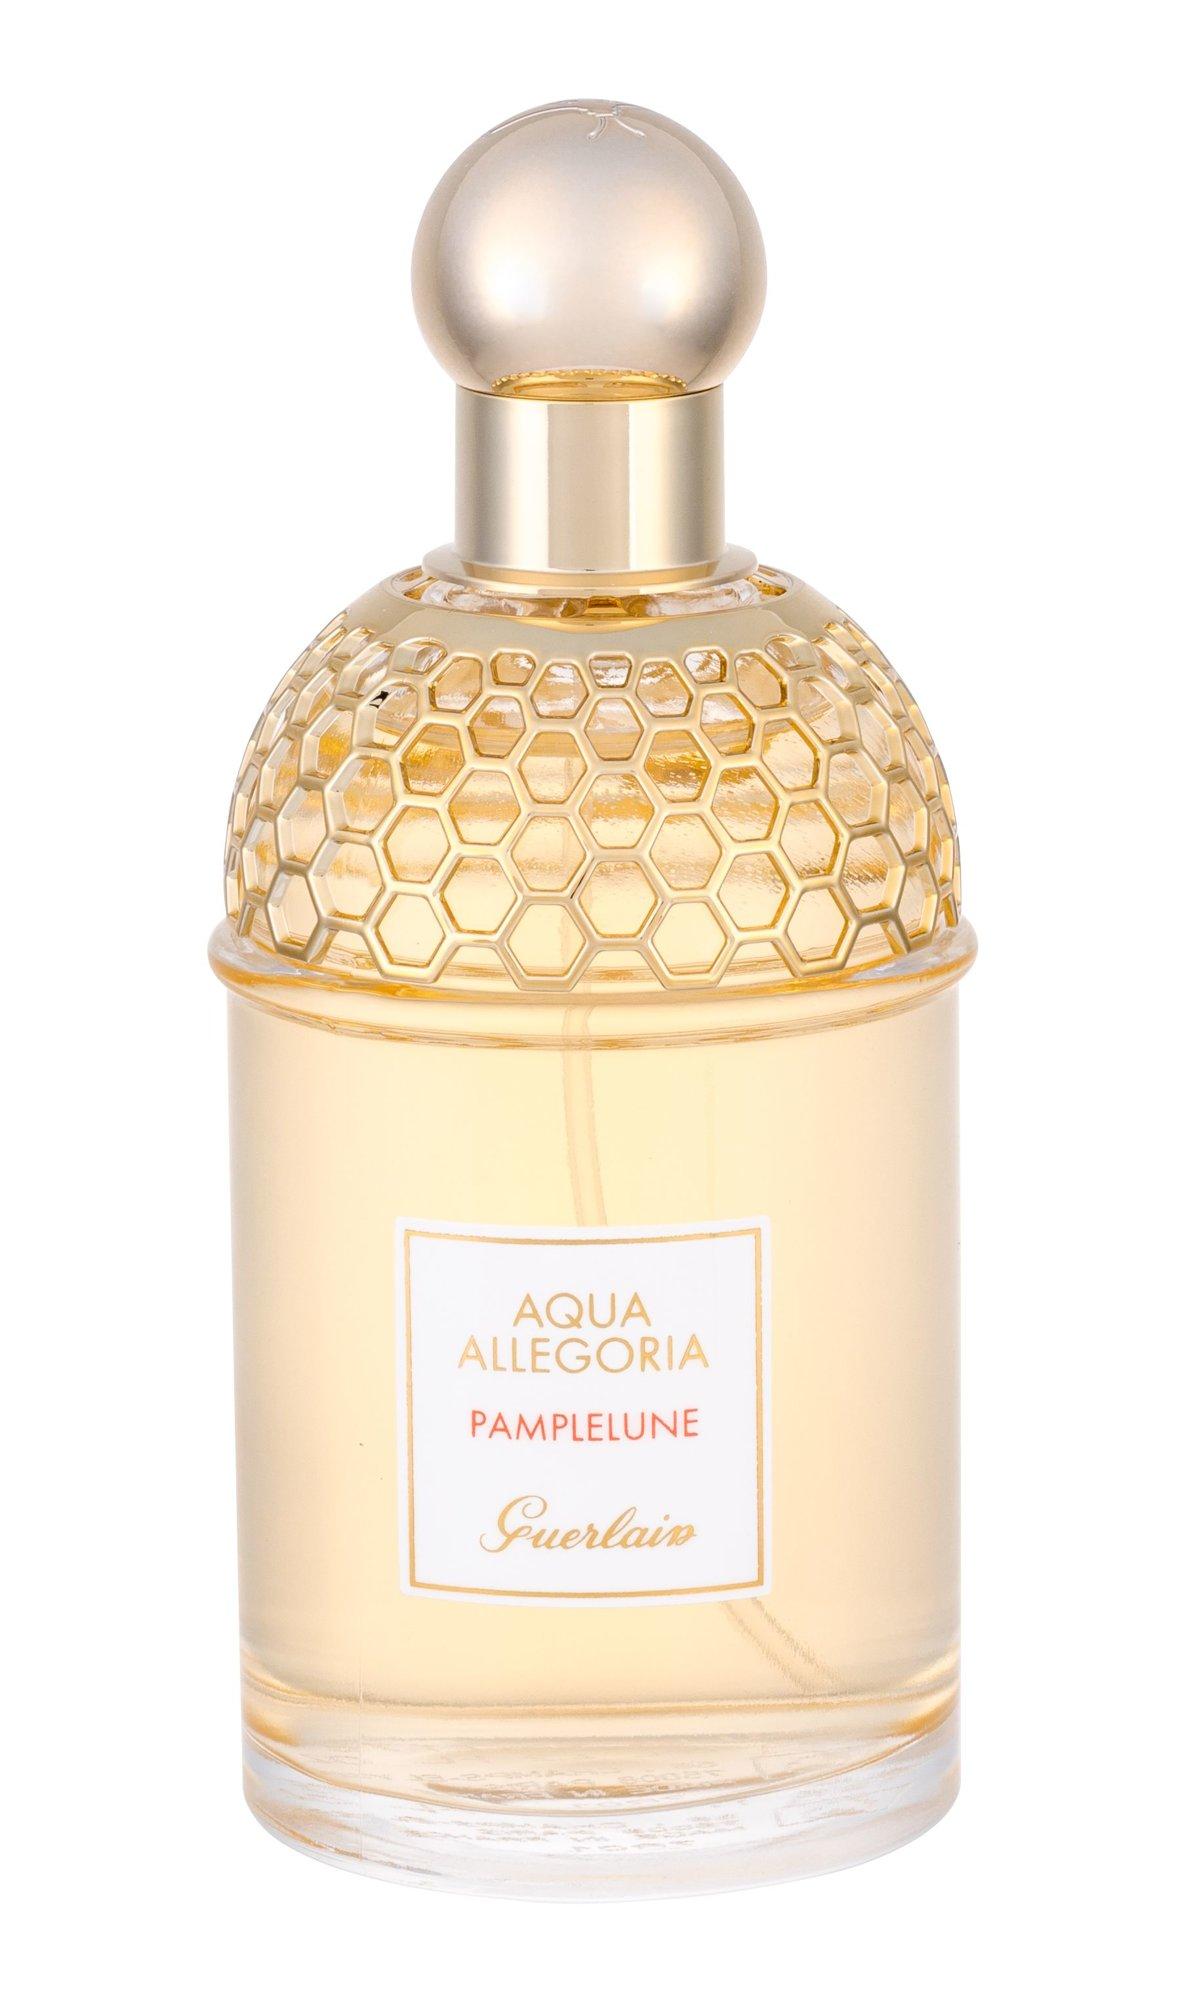 Guerlain Aqua Allegoria Pamplelune EDT 125ml